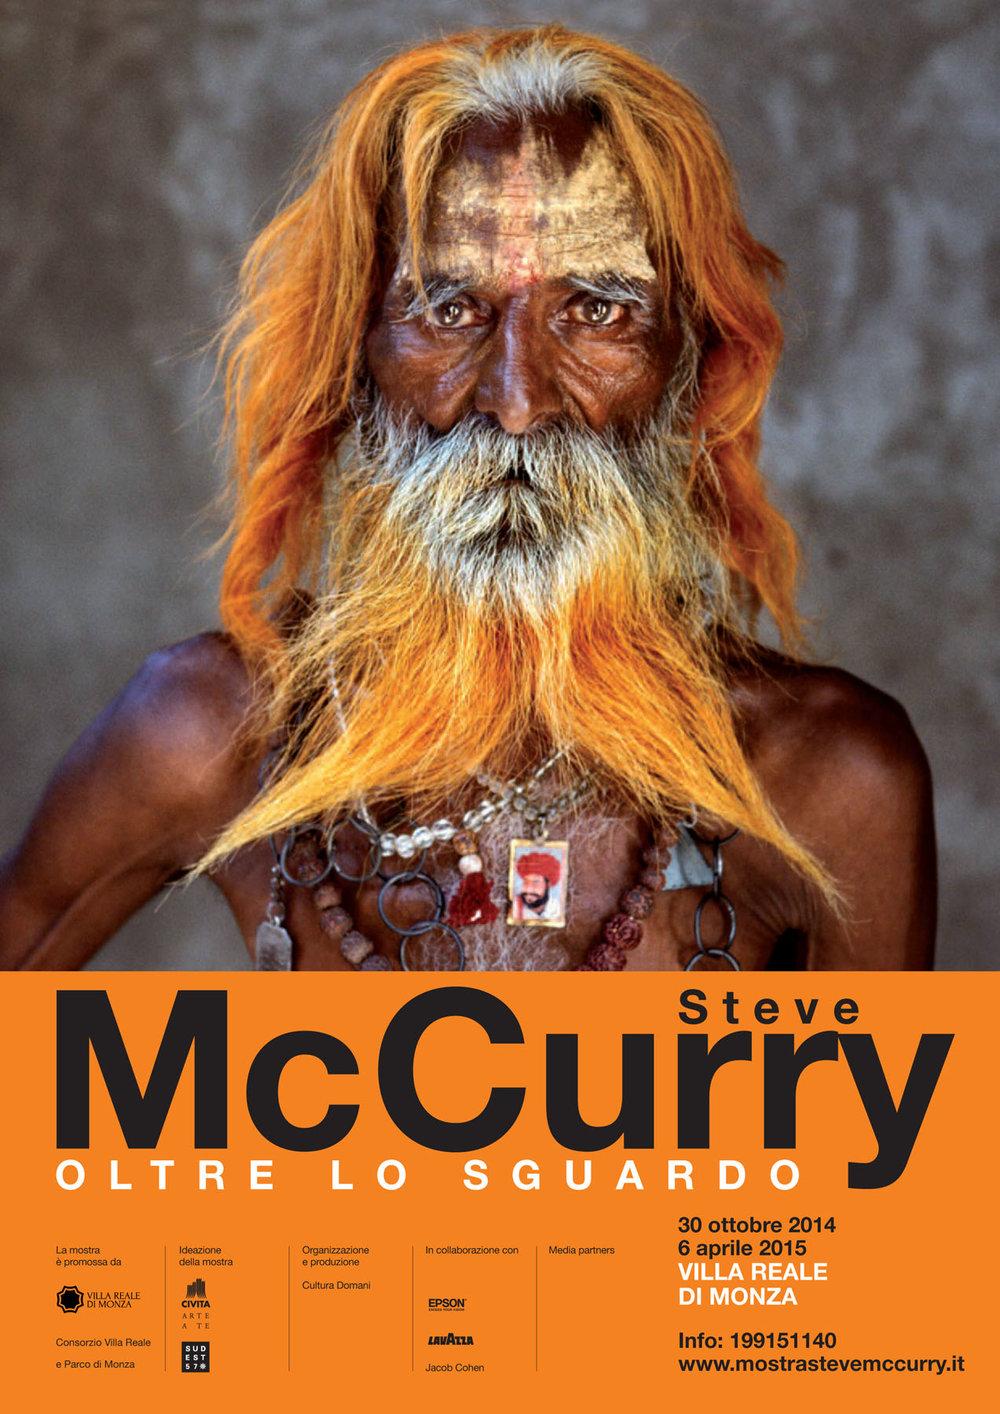 McCurry_OltreloSguardo_Monza.jpg